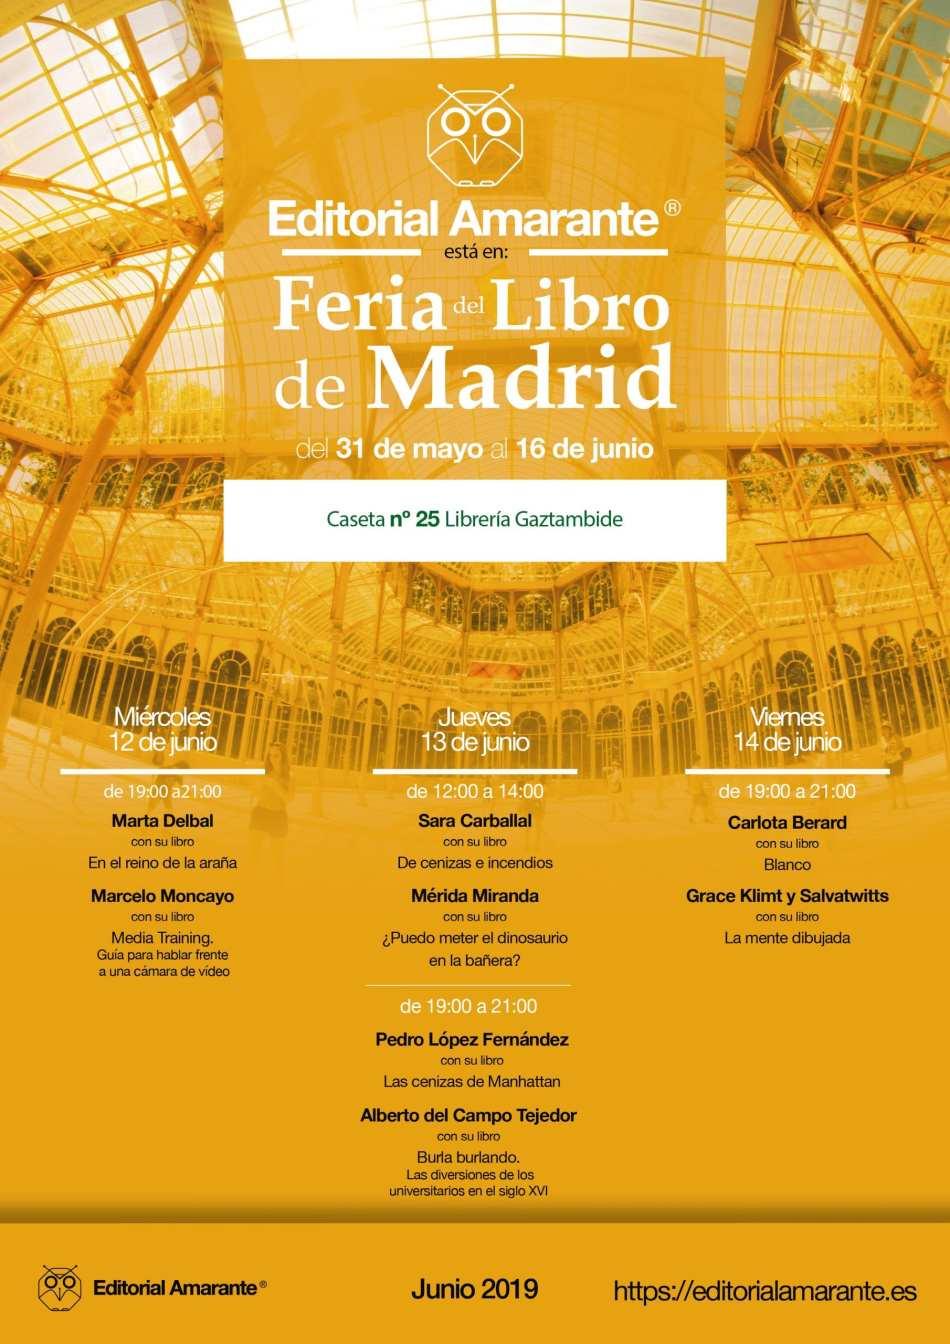 Cartel A3 Feria del Libro Madrid 2019 Amarante-01